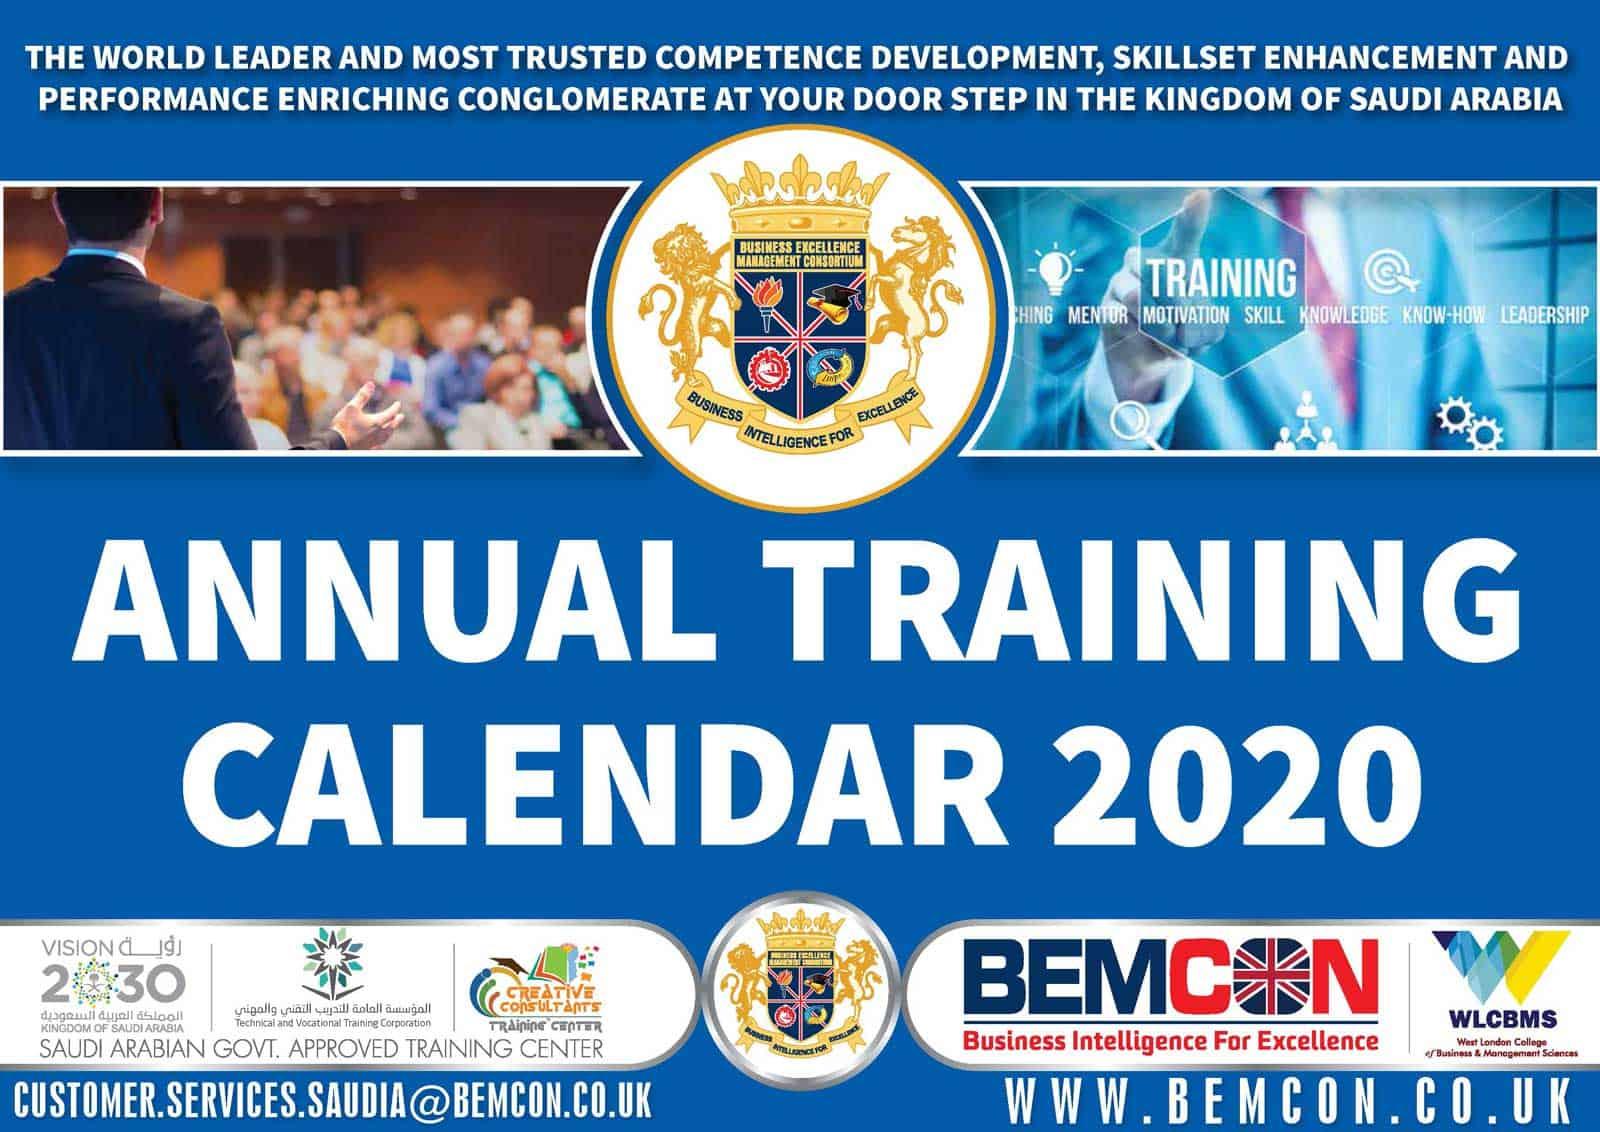 BEMCON Anual Training Calendar